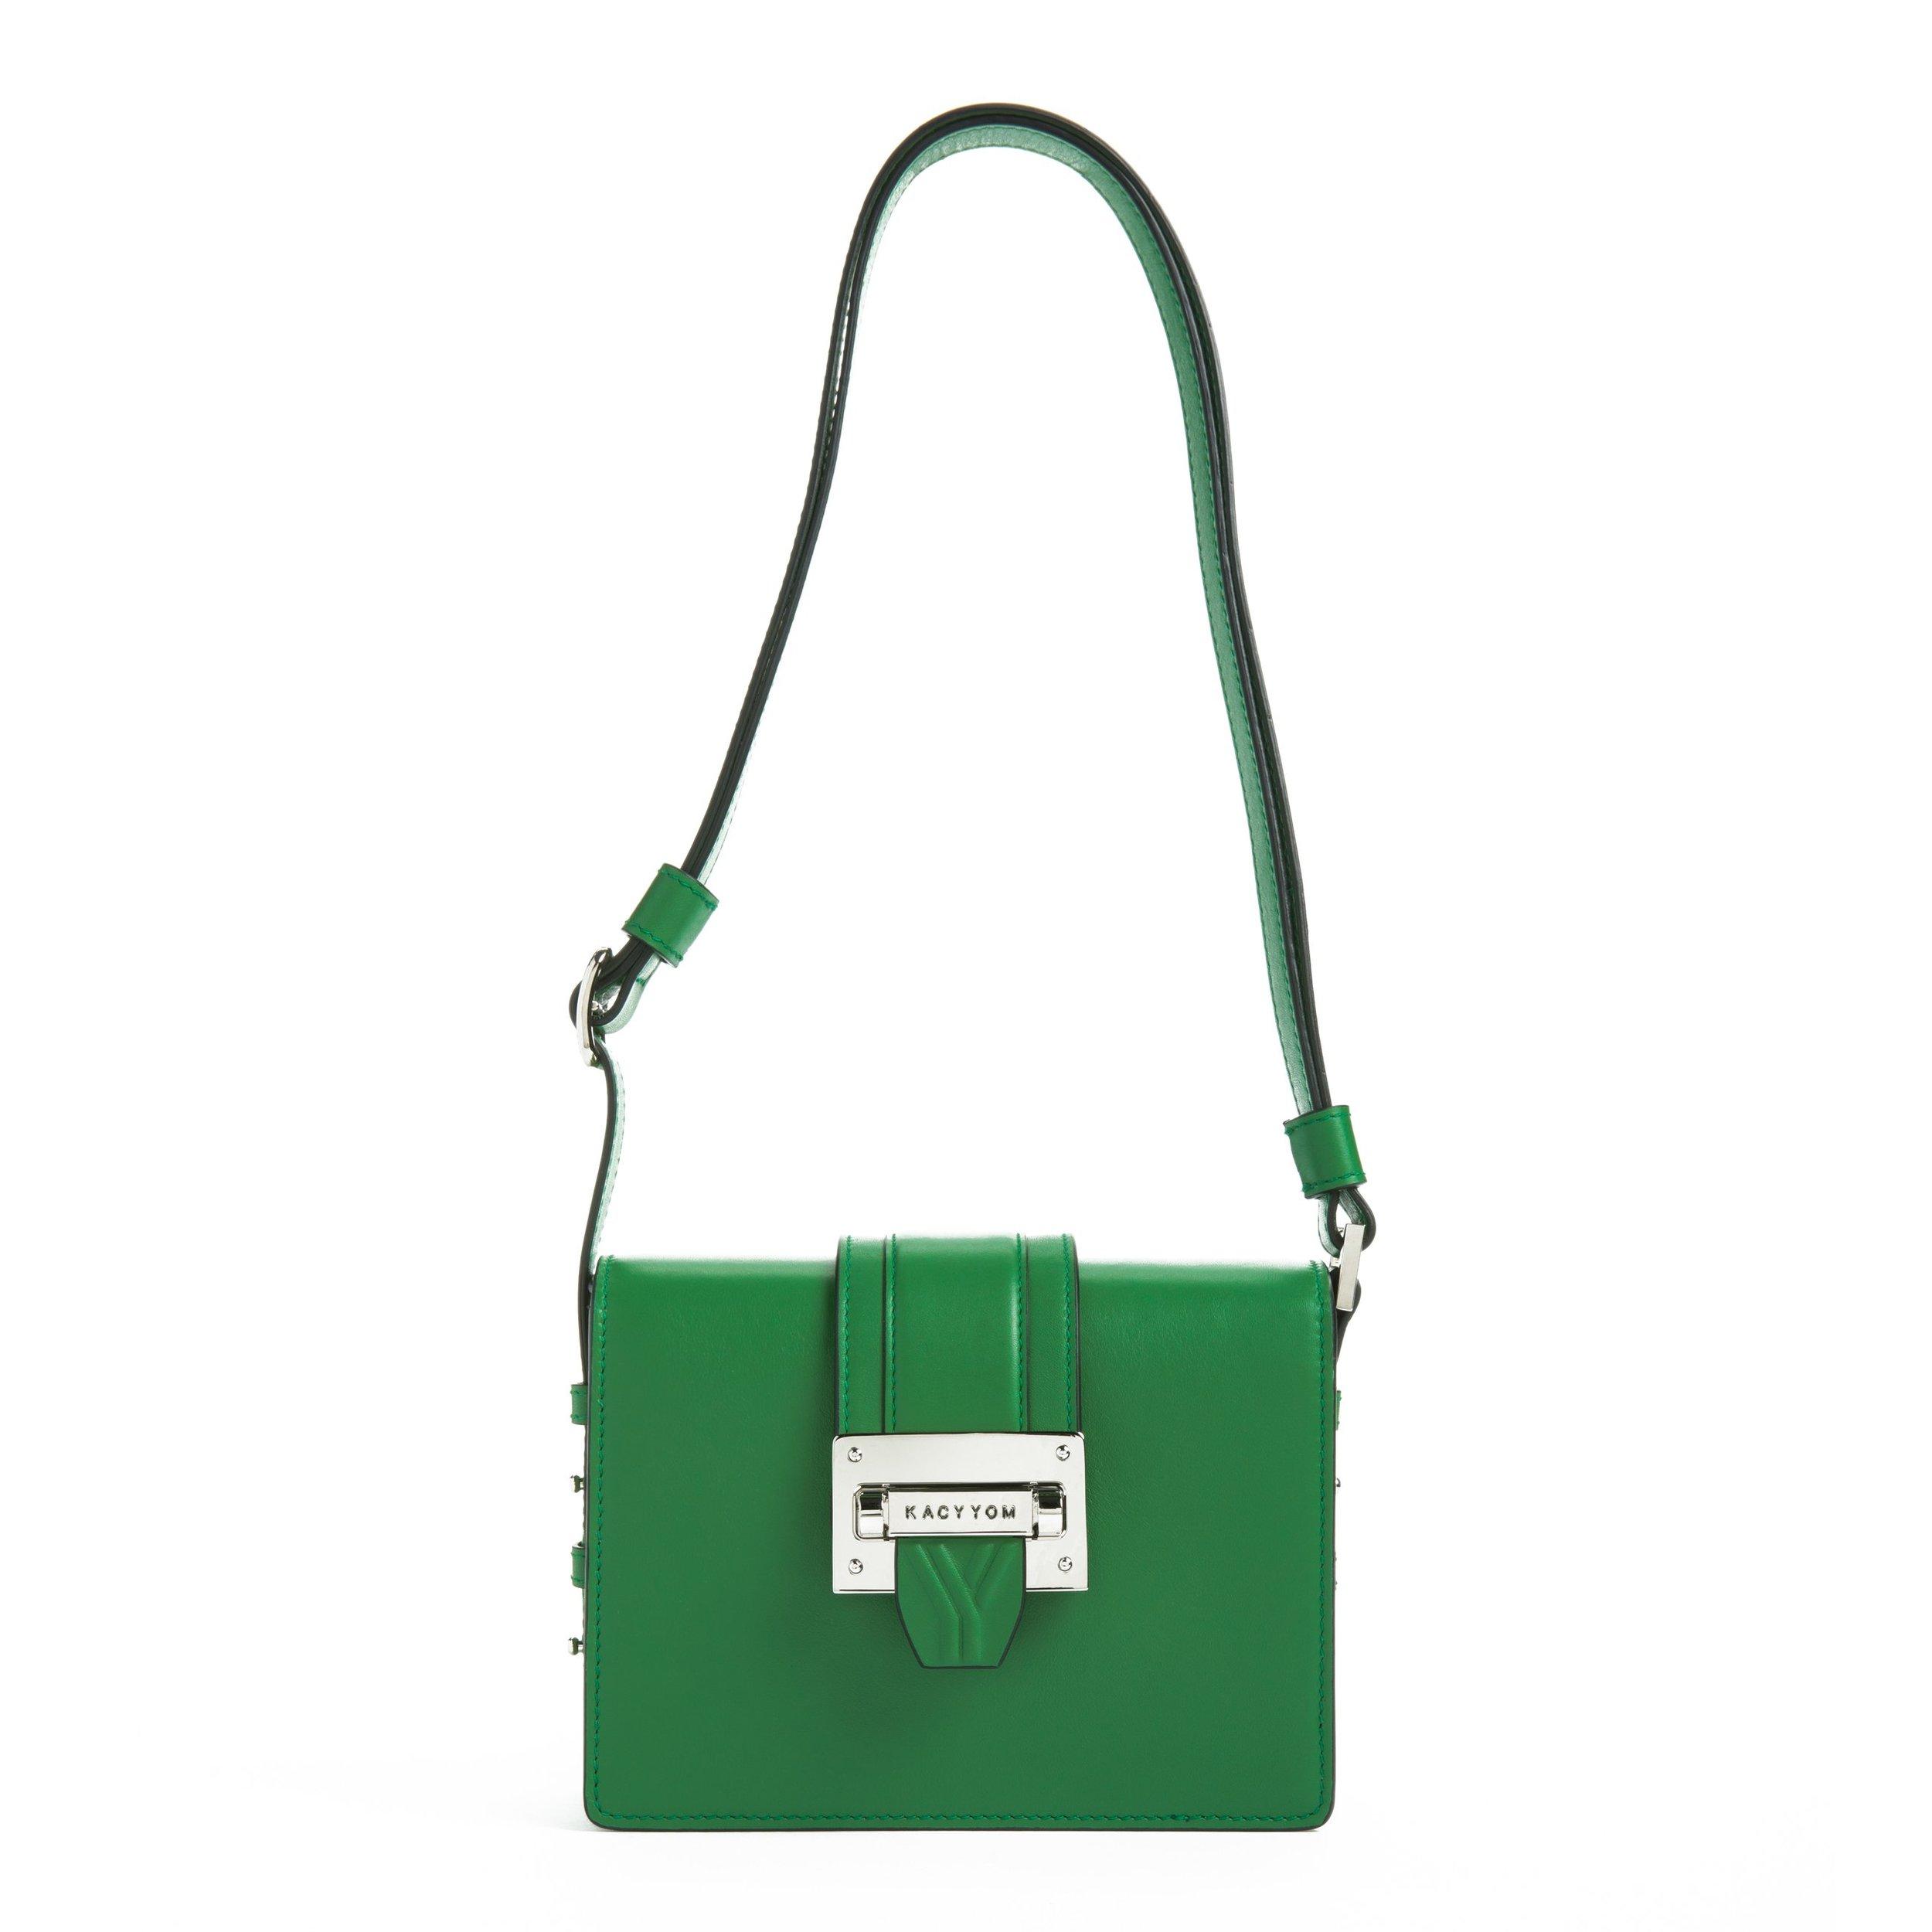 KACYYOM Crossbody Bag $650